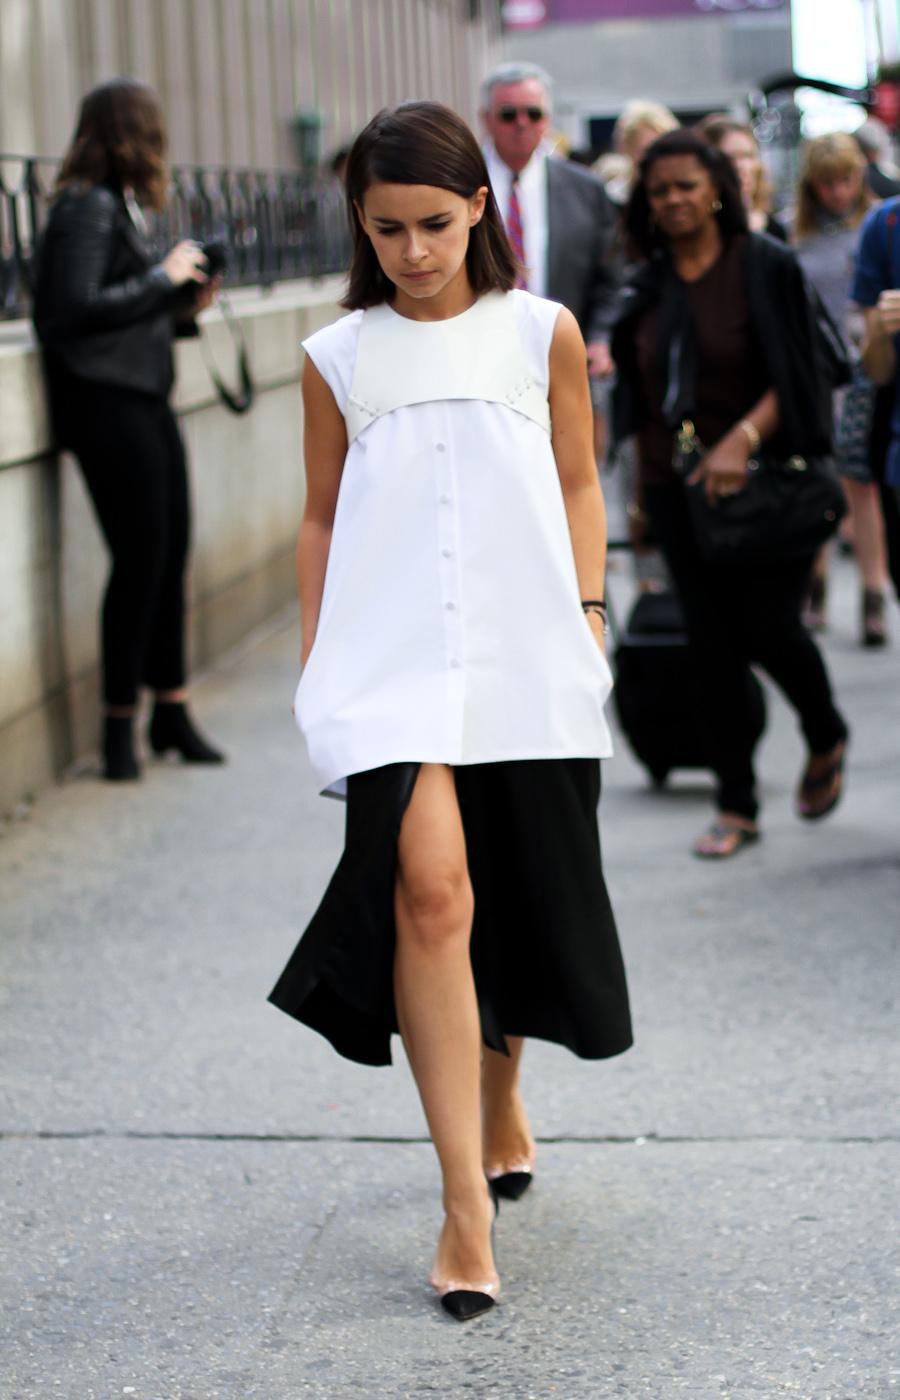 IMG_4614-Clochet-New-York-Fashion-Week-Miroslava-Duma.jpg